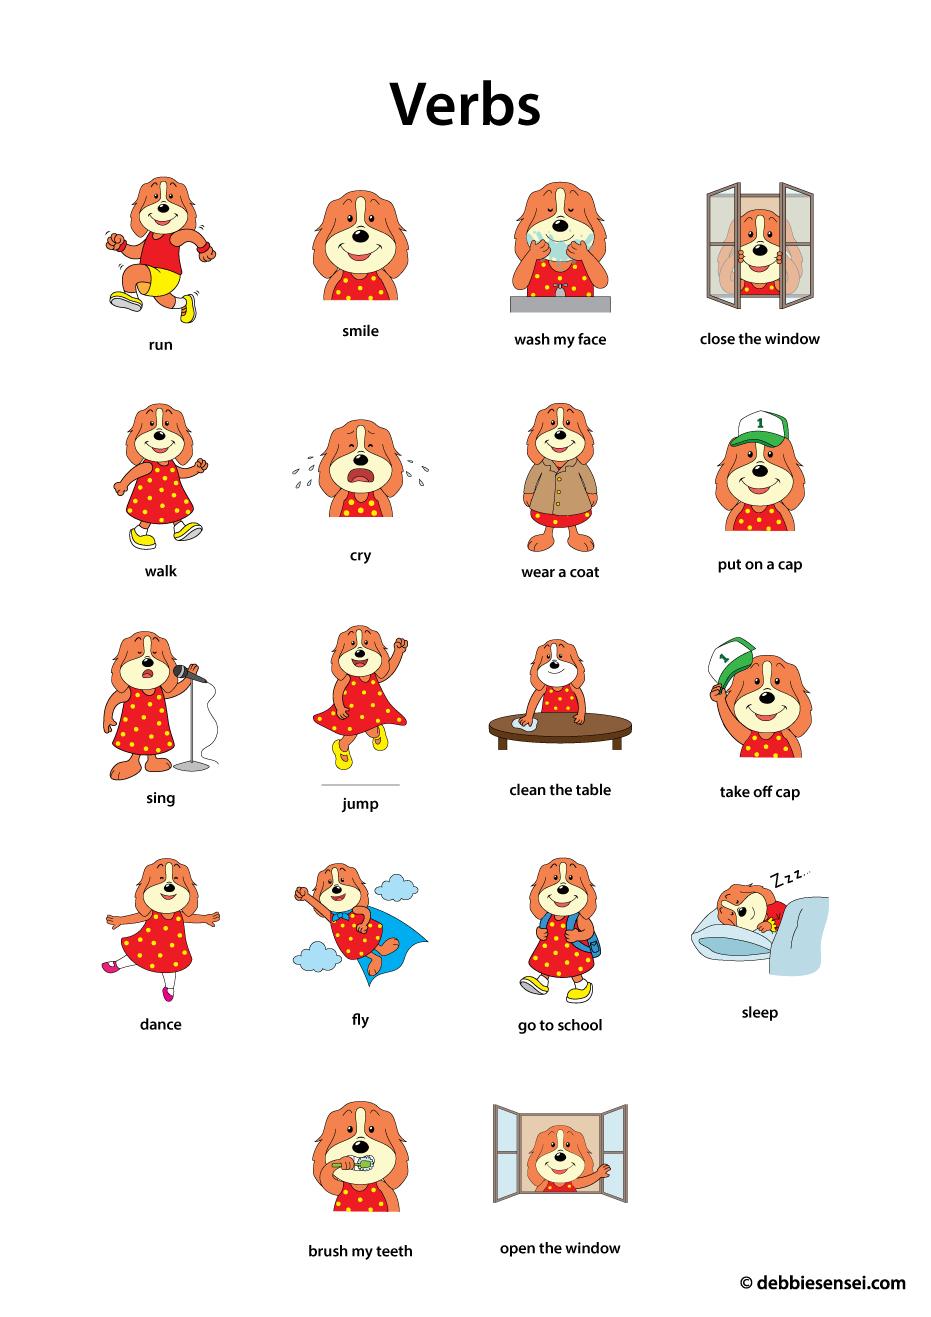 Debbie Sensei - Free Esl Verbs Flashcards - Free Printable Spanish Verb Flashcards